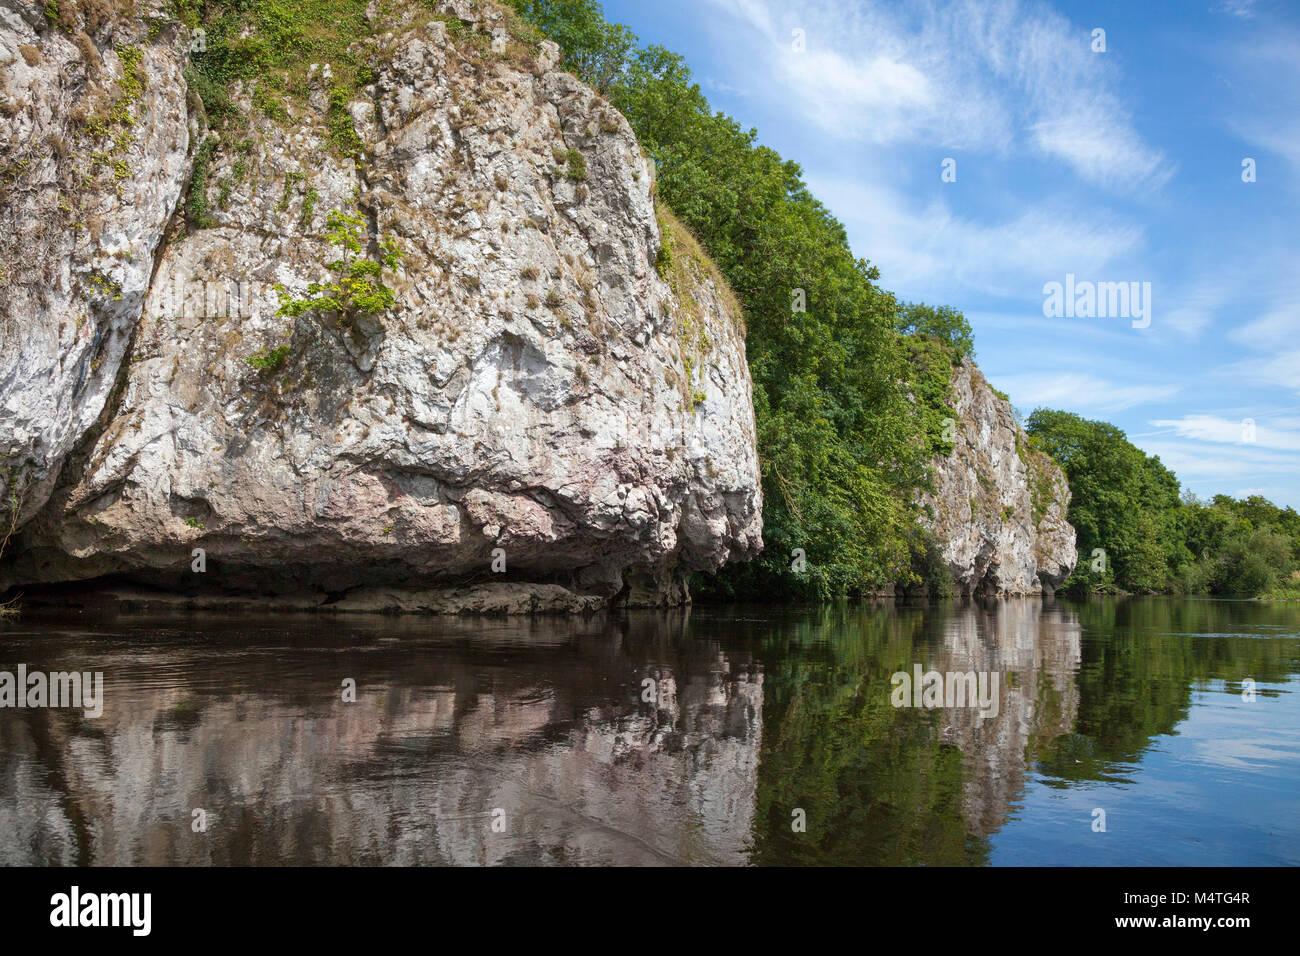 Limestone cliffs along the Blackwater River, Mallow, County Cork, Ireland. - Stock Image